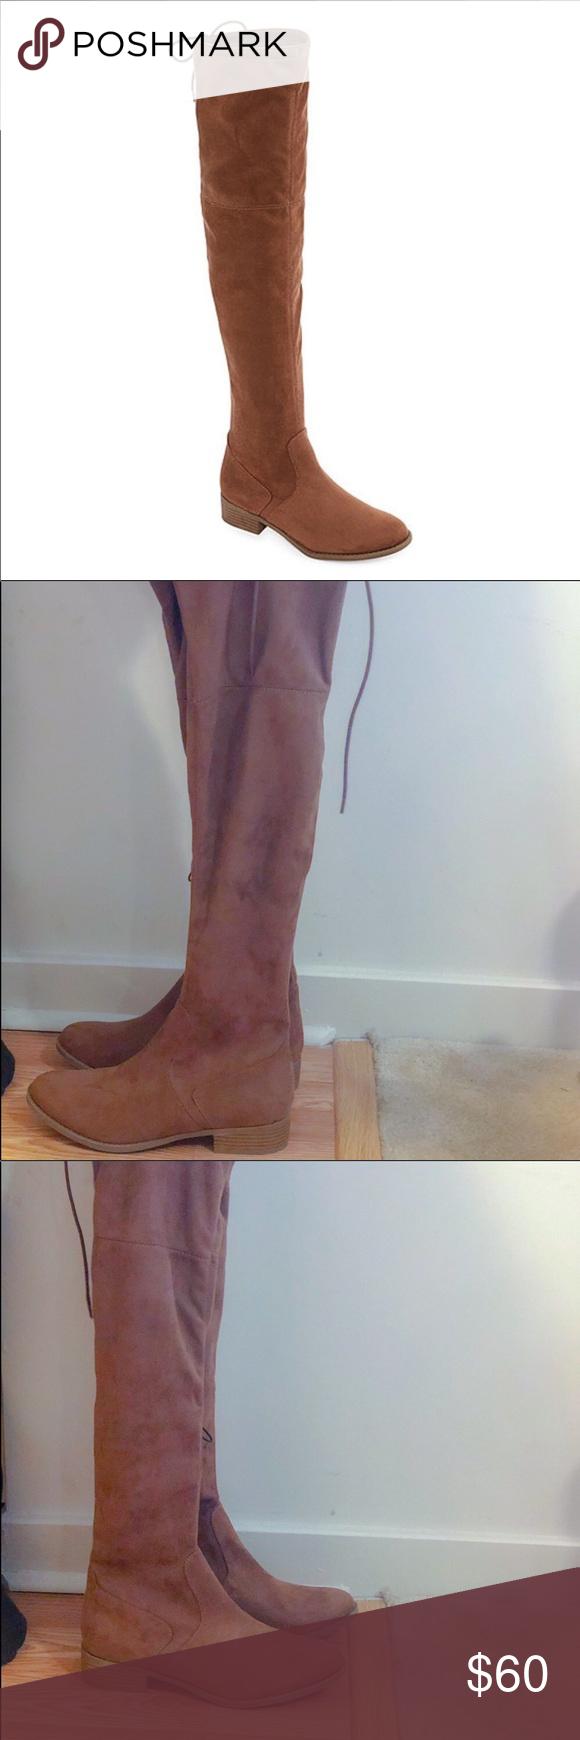 8d296345e6a Arizona OTK Taupe Boots NWT Size 8 MSRP  80 Retails  80! Arizona OTK Over  the